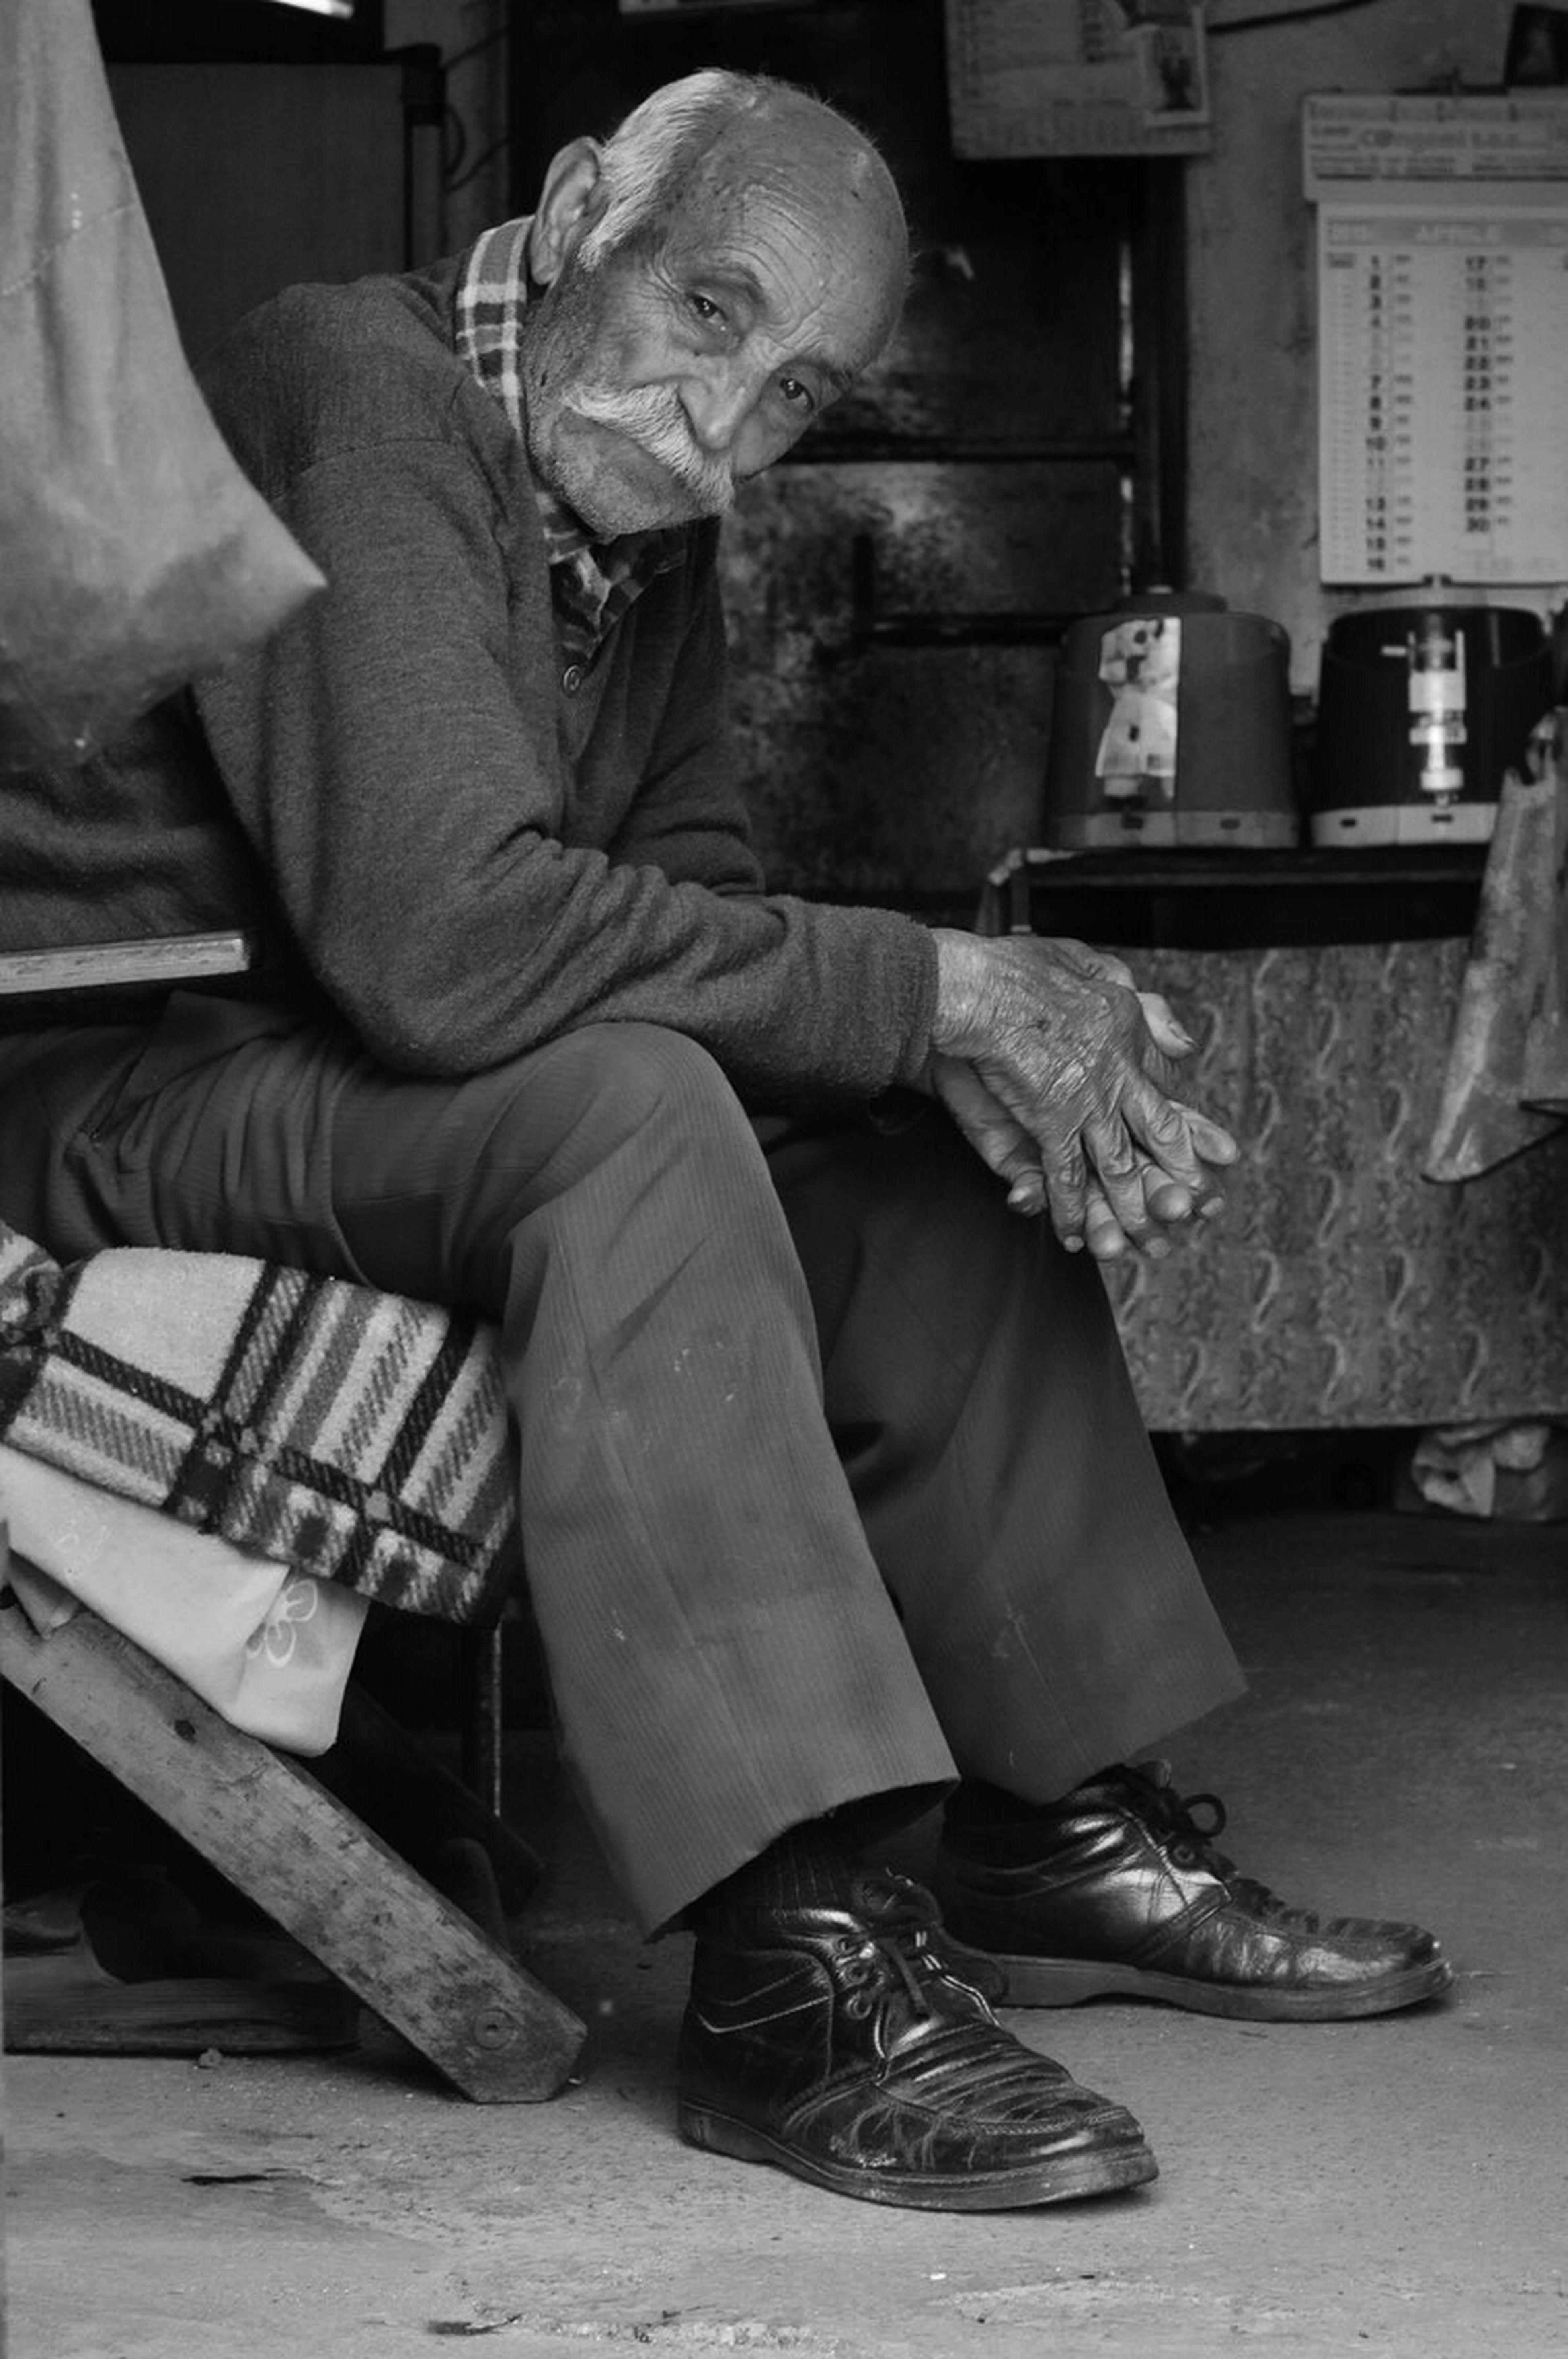 Uniqueness The Zio. Italy Molochio Blackandwhite Nikon Real People Photo Pilgrim Real Life Aged Stare One Person